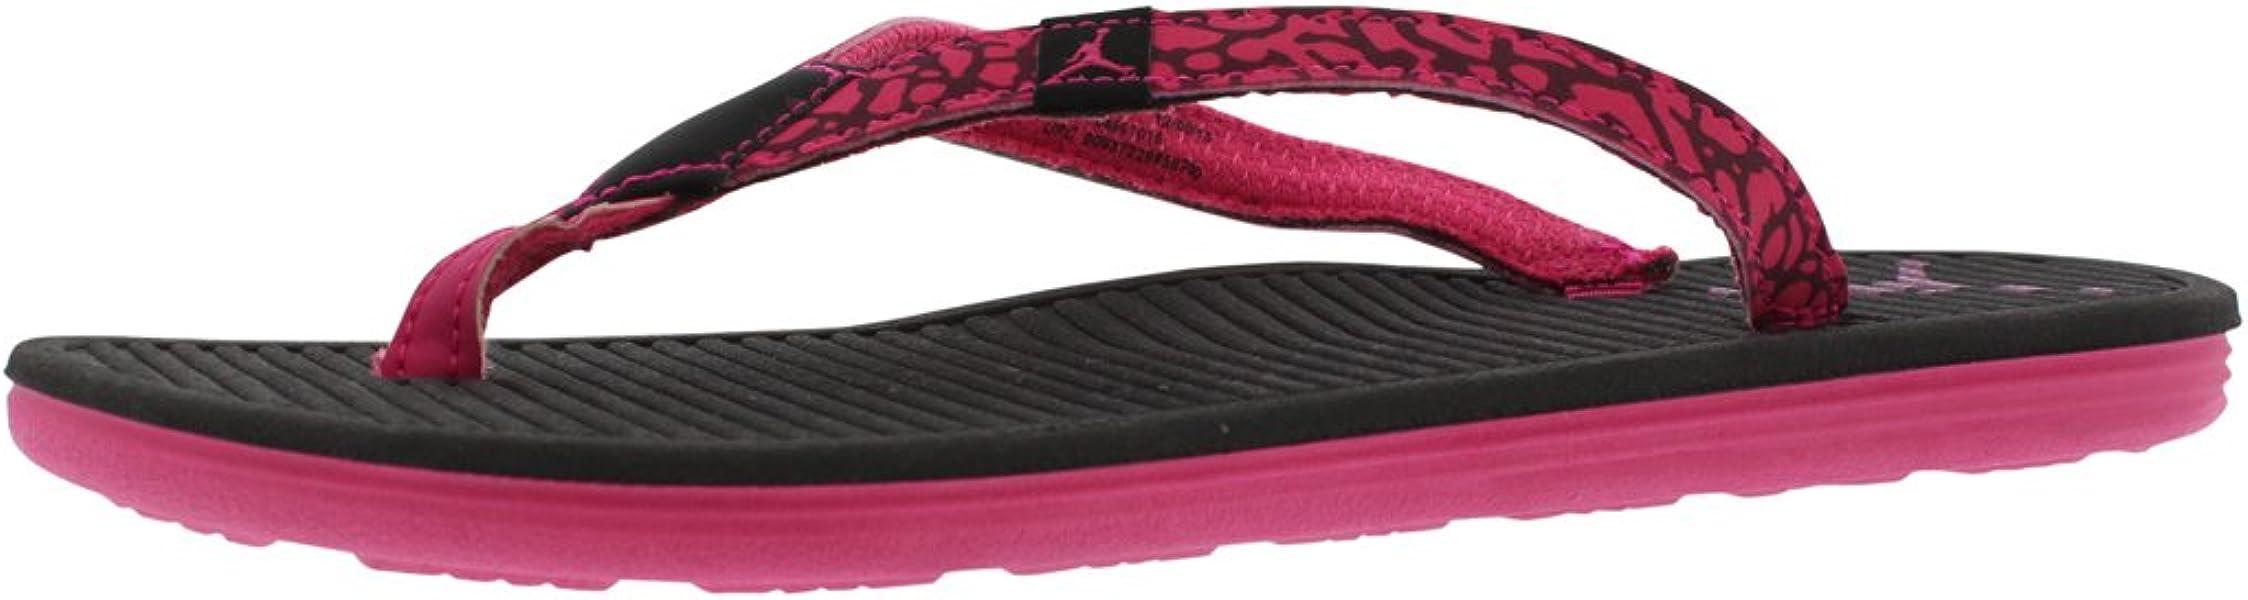 dc9472176230cb Nike Girl s Women s Jordan Flip Flops GG Sandals Black Vivid Pink Size ...